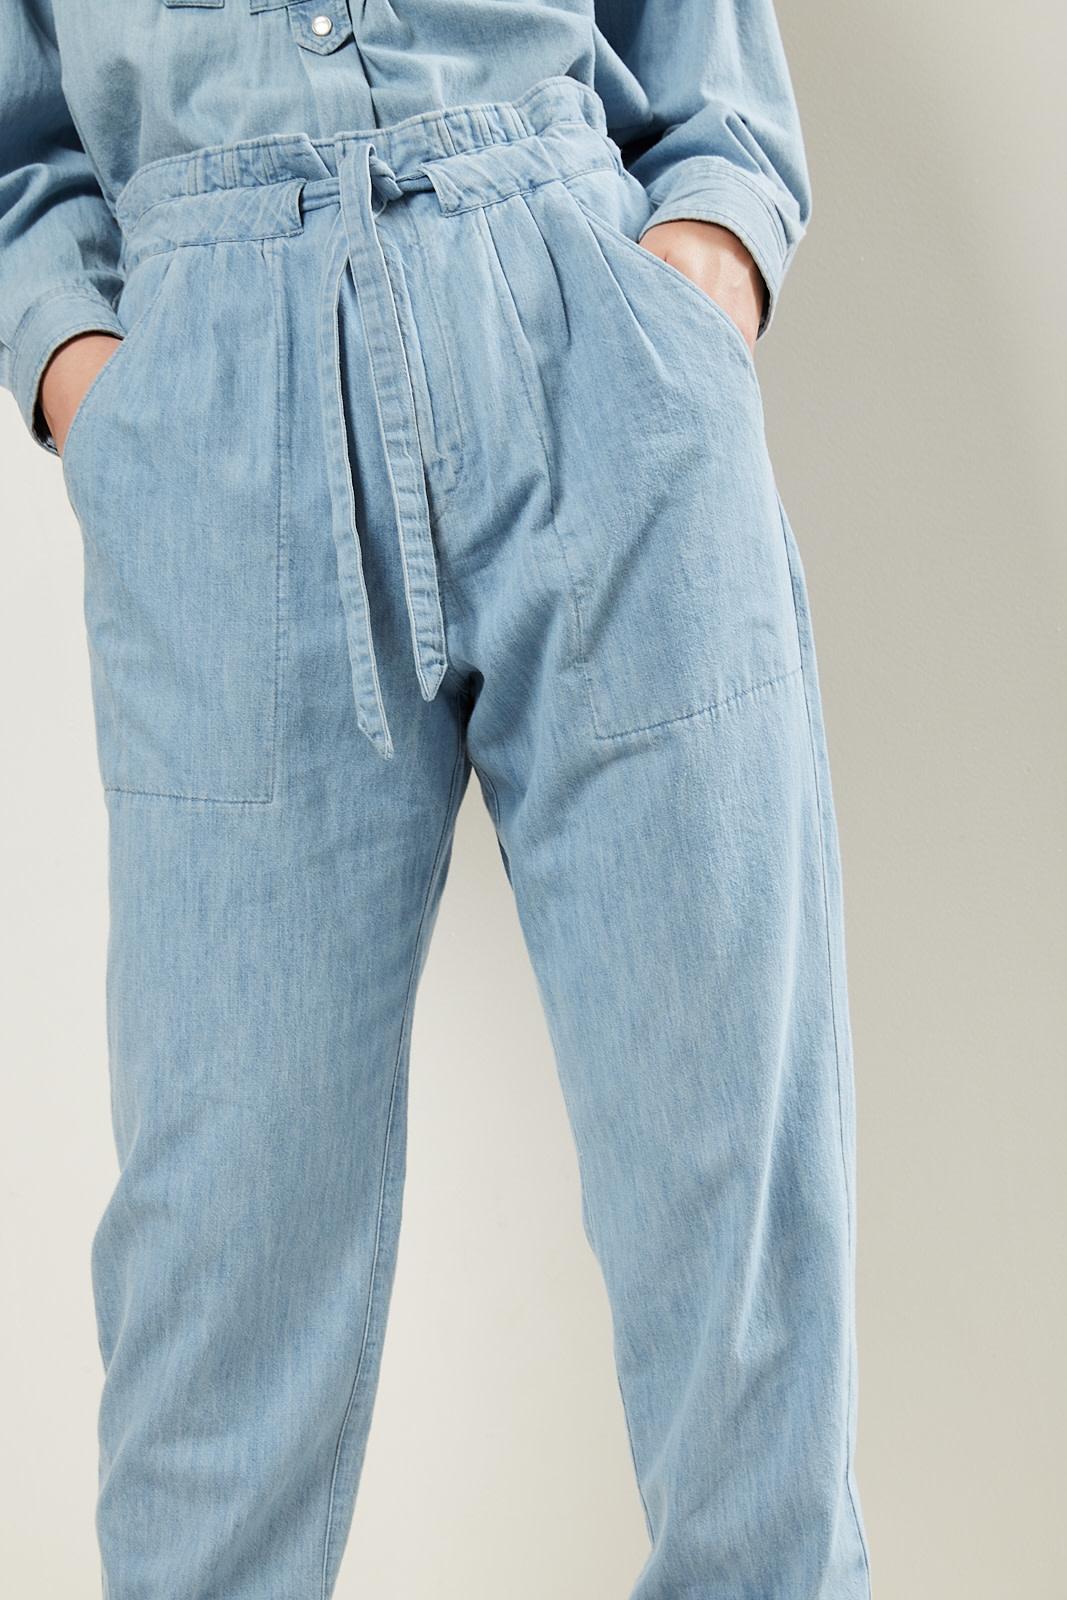 Etoile Isabel Marant - Muardo jeans trousers